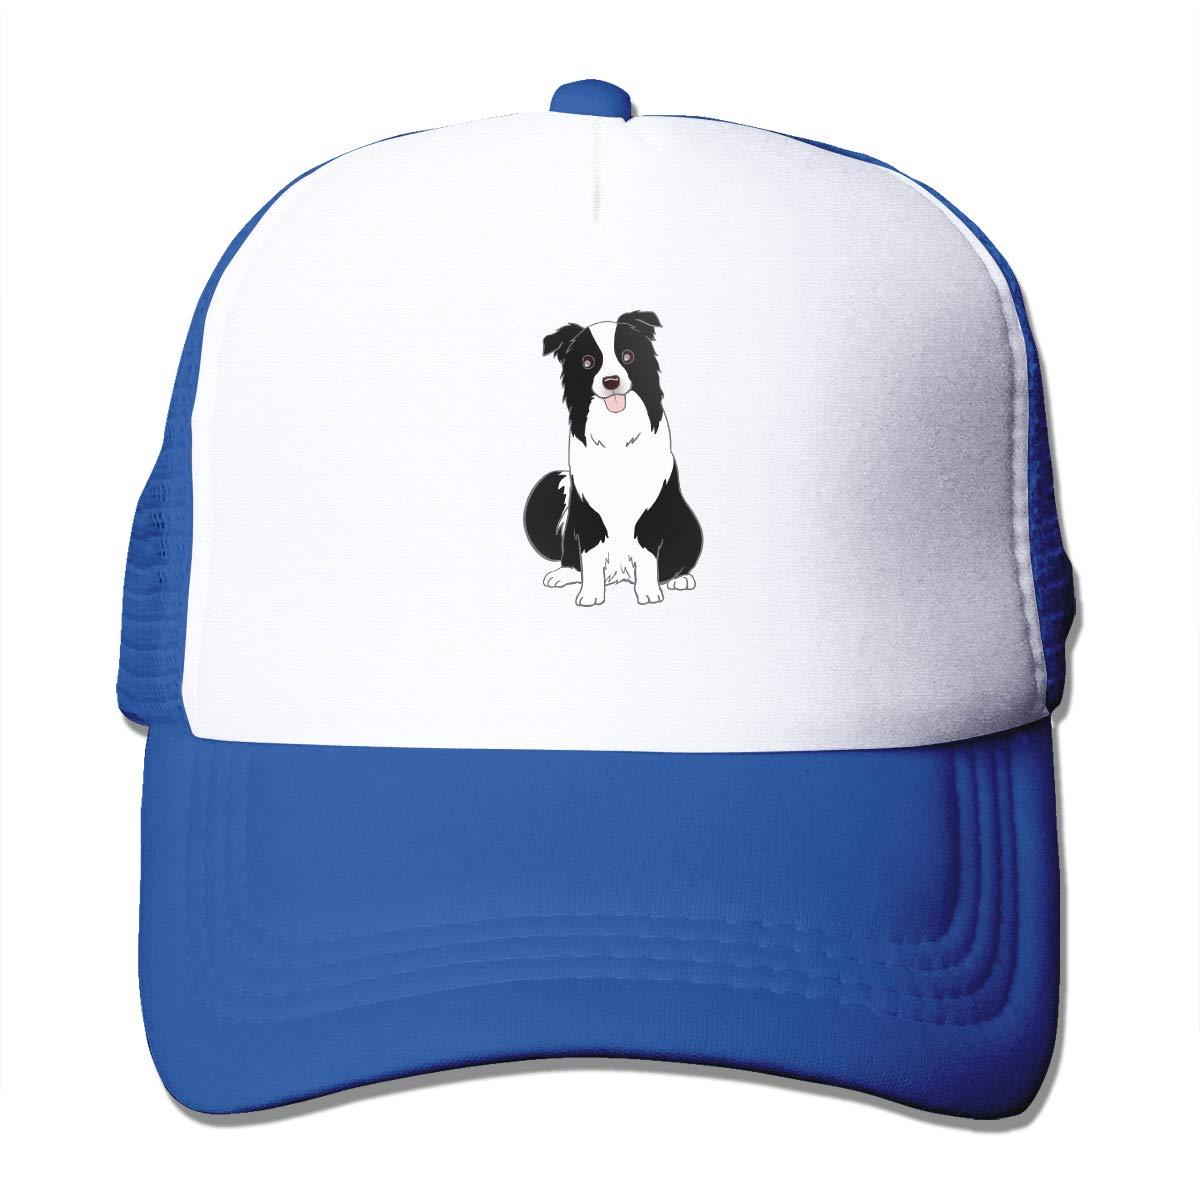 ShenigonA Border Collie Stole My Heart Intelligent Breed Sun Protection Adjustable Caps Cooling Mesh Hat Blue